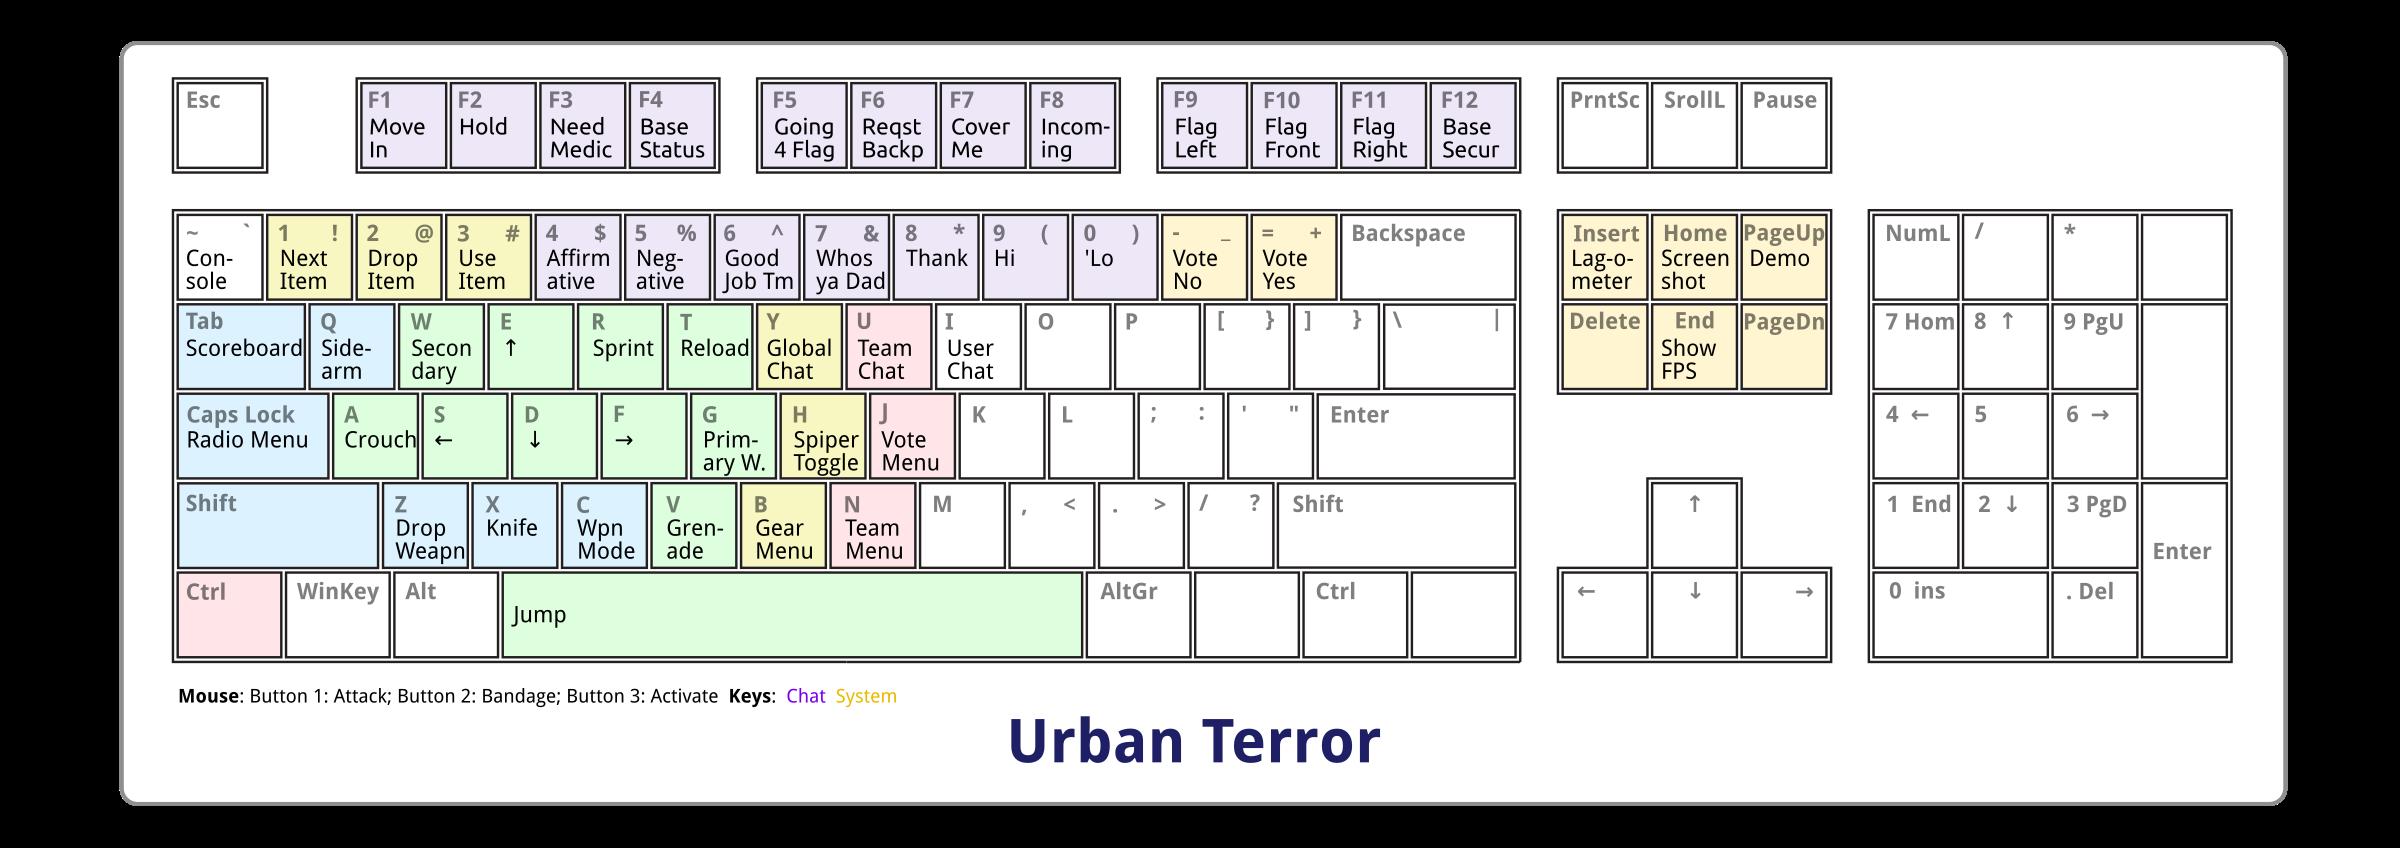 Urban terror mappings big. Keyboard clipart item